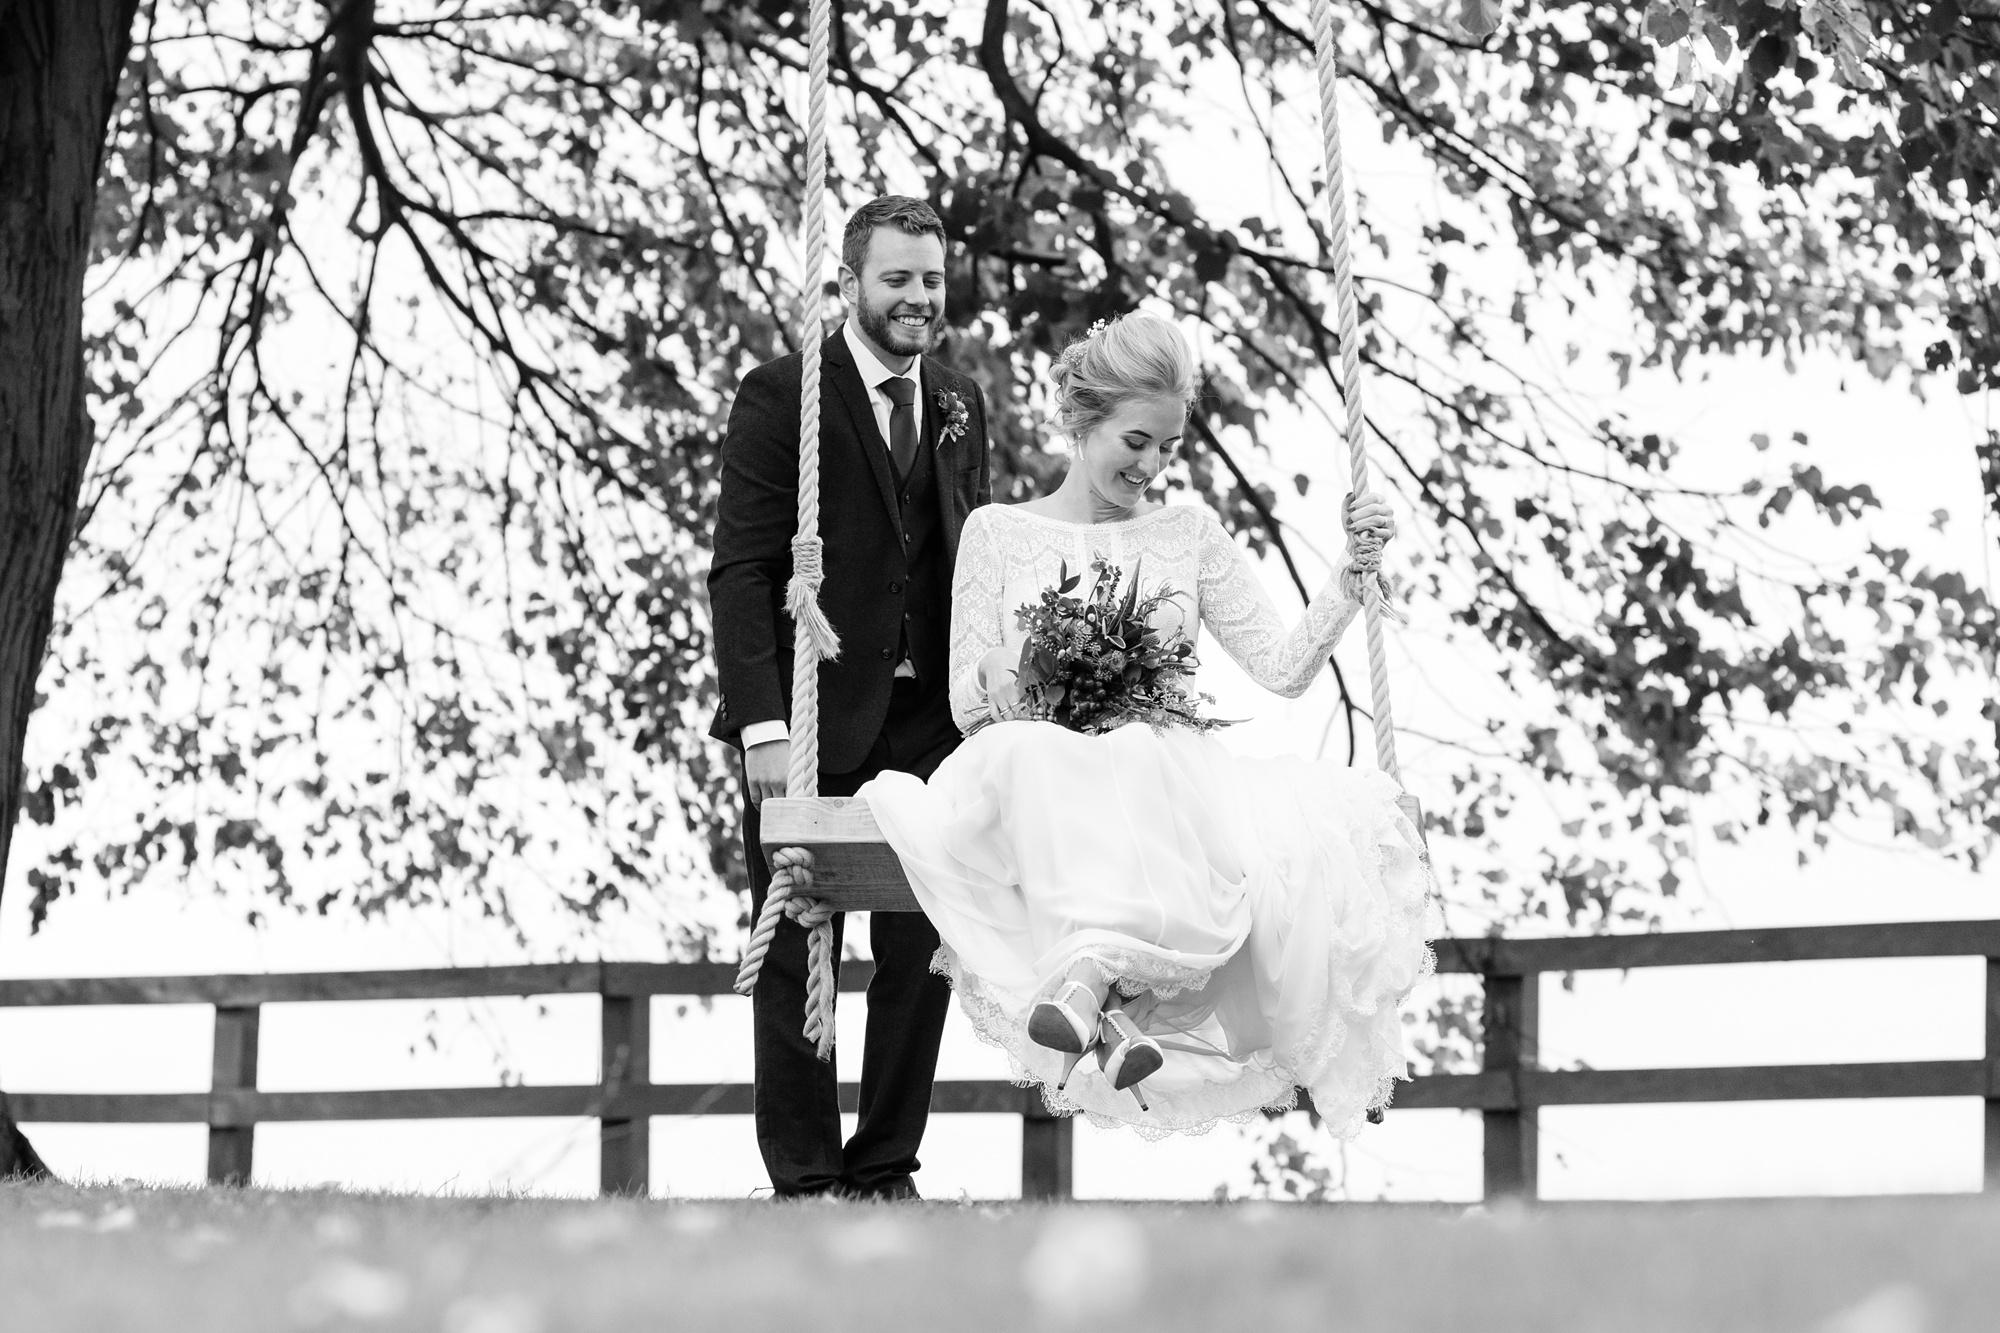 Barmbyfield Barn Wedding Photography the couple on a swing